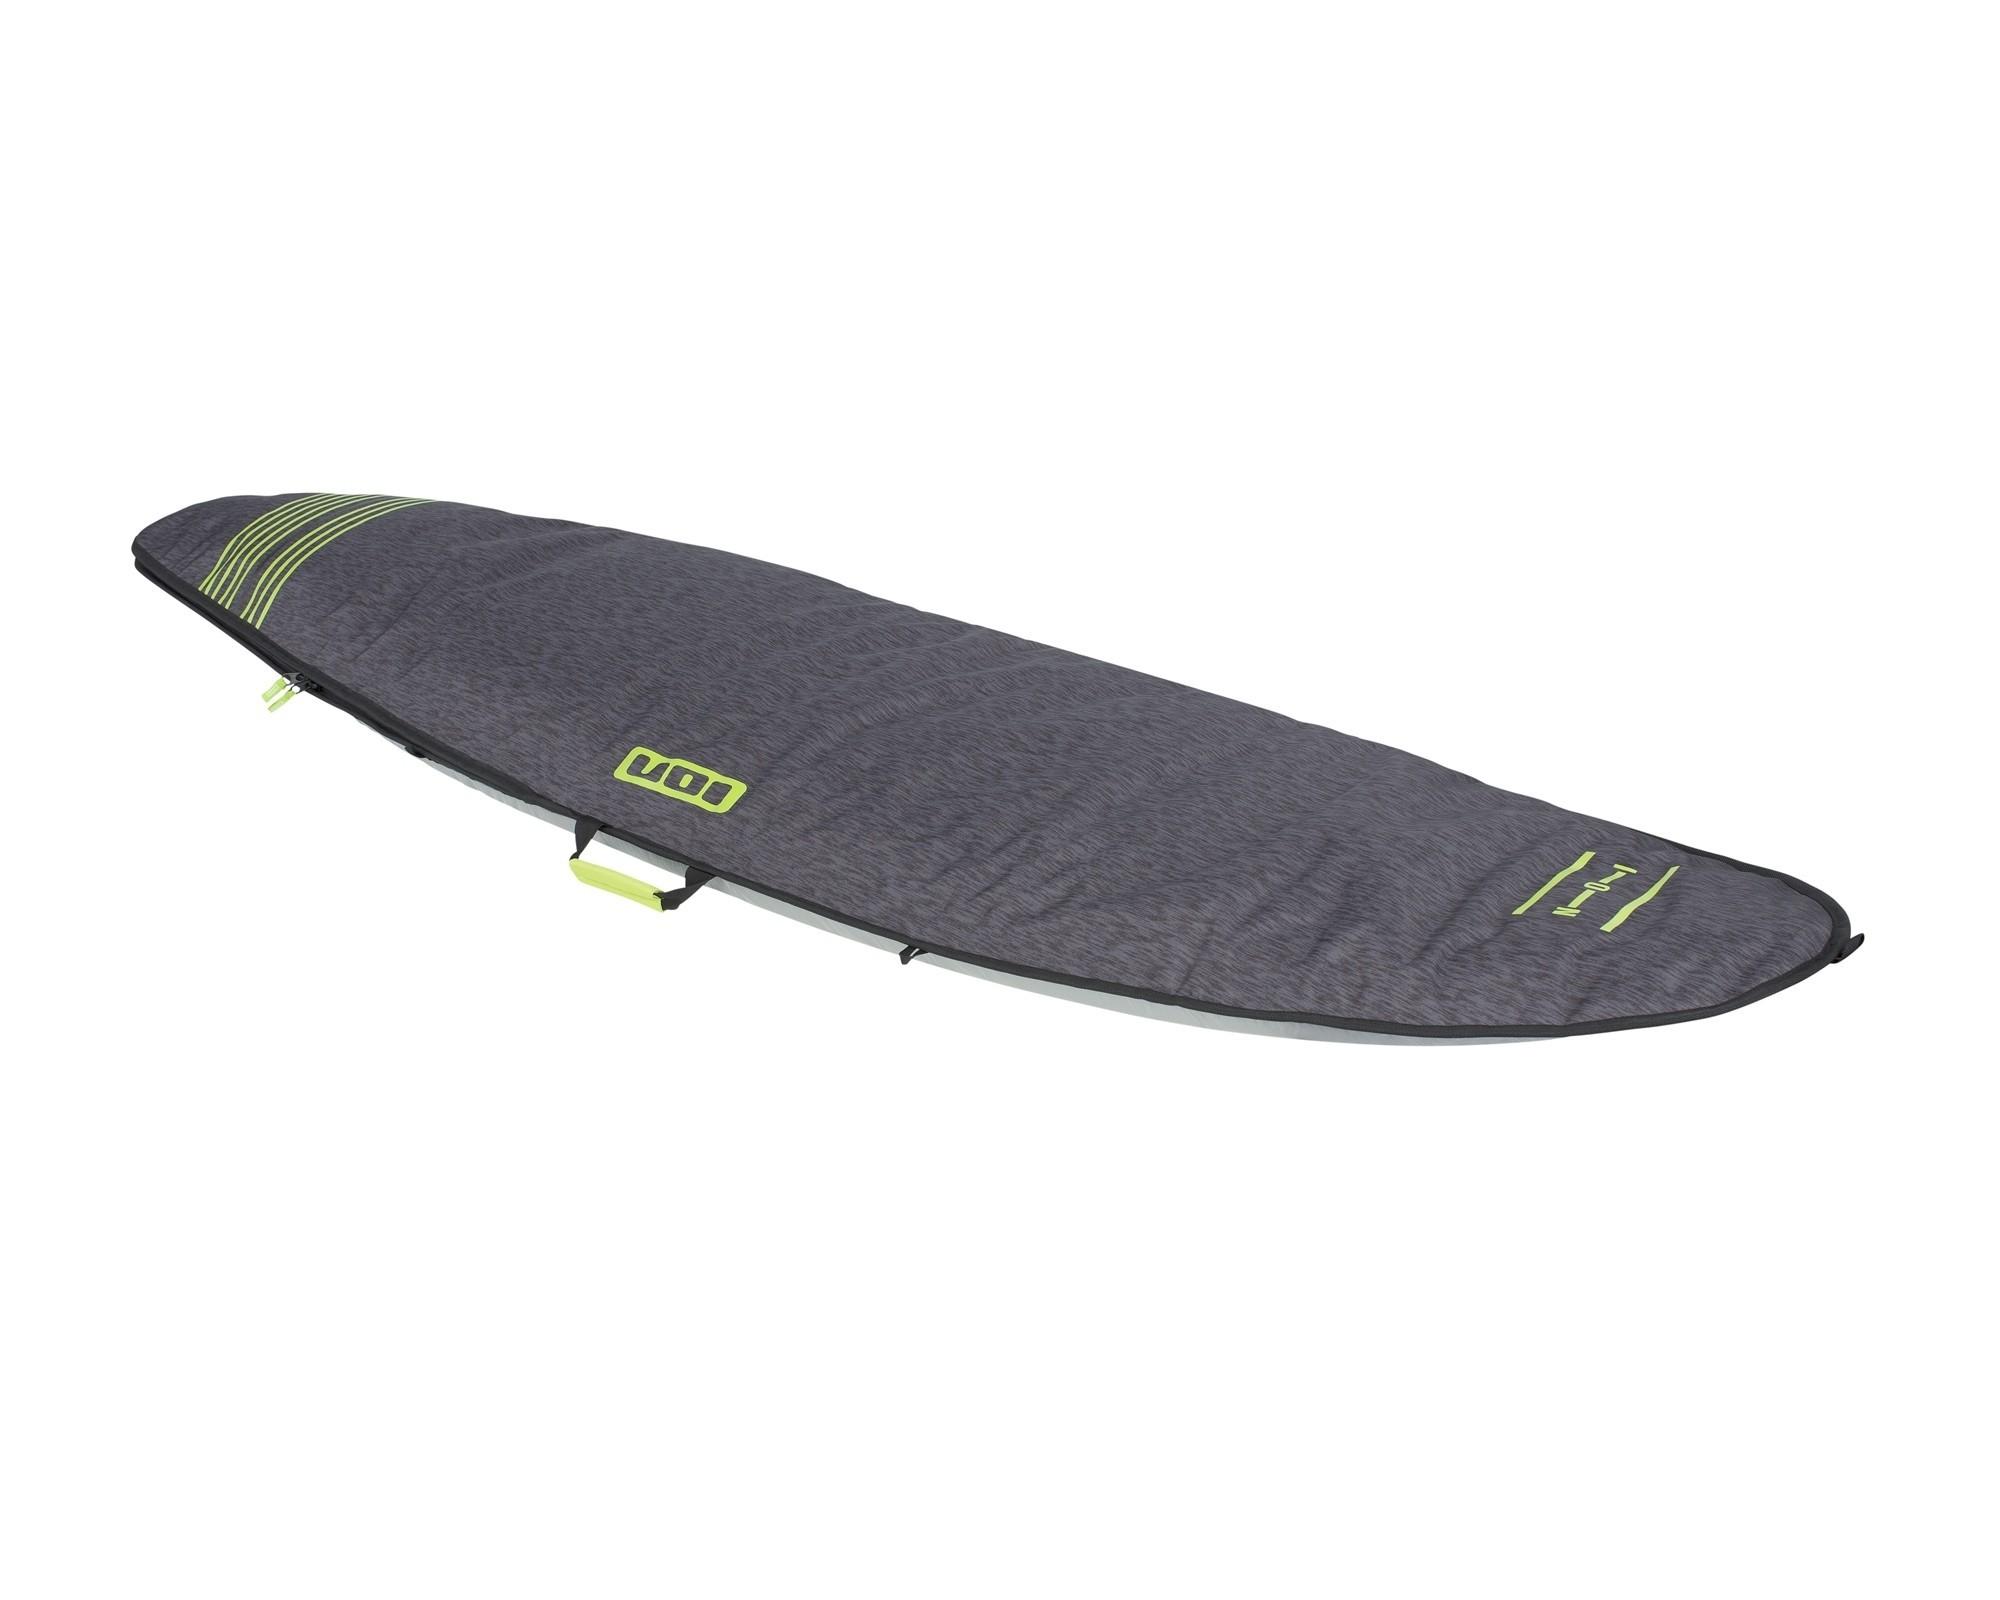 Ion windsurf Core boardbag